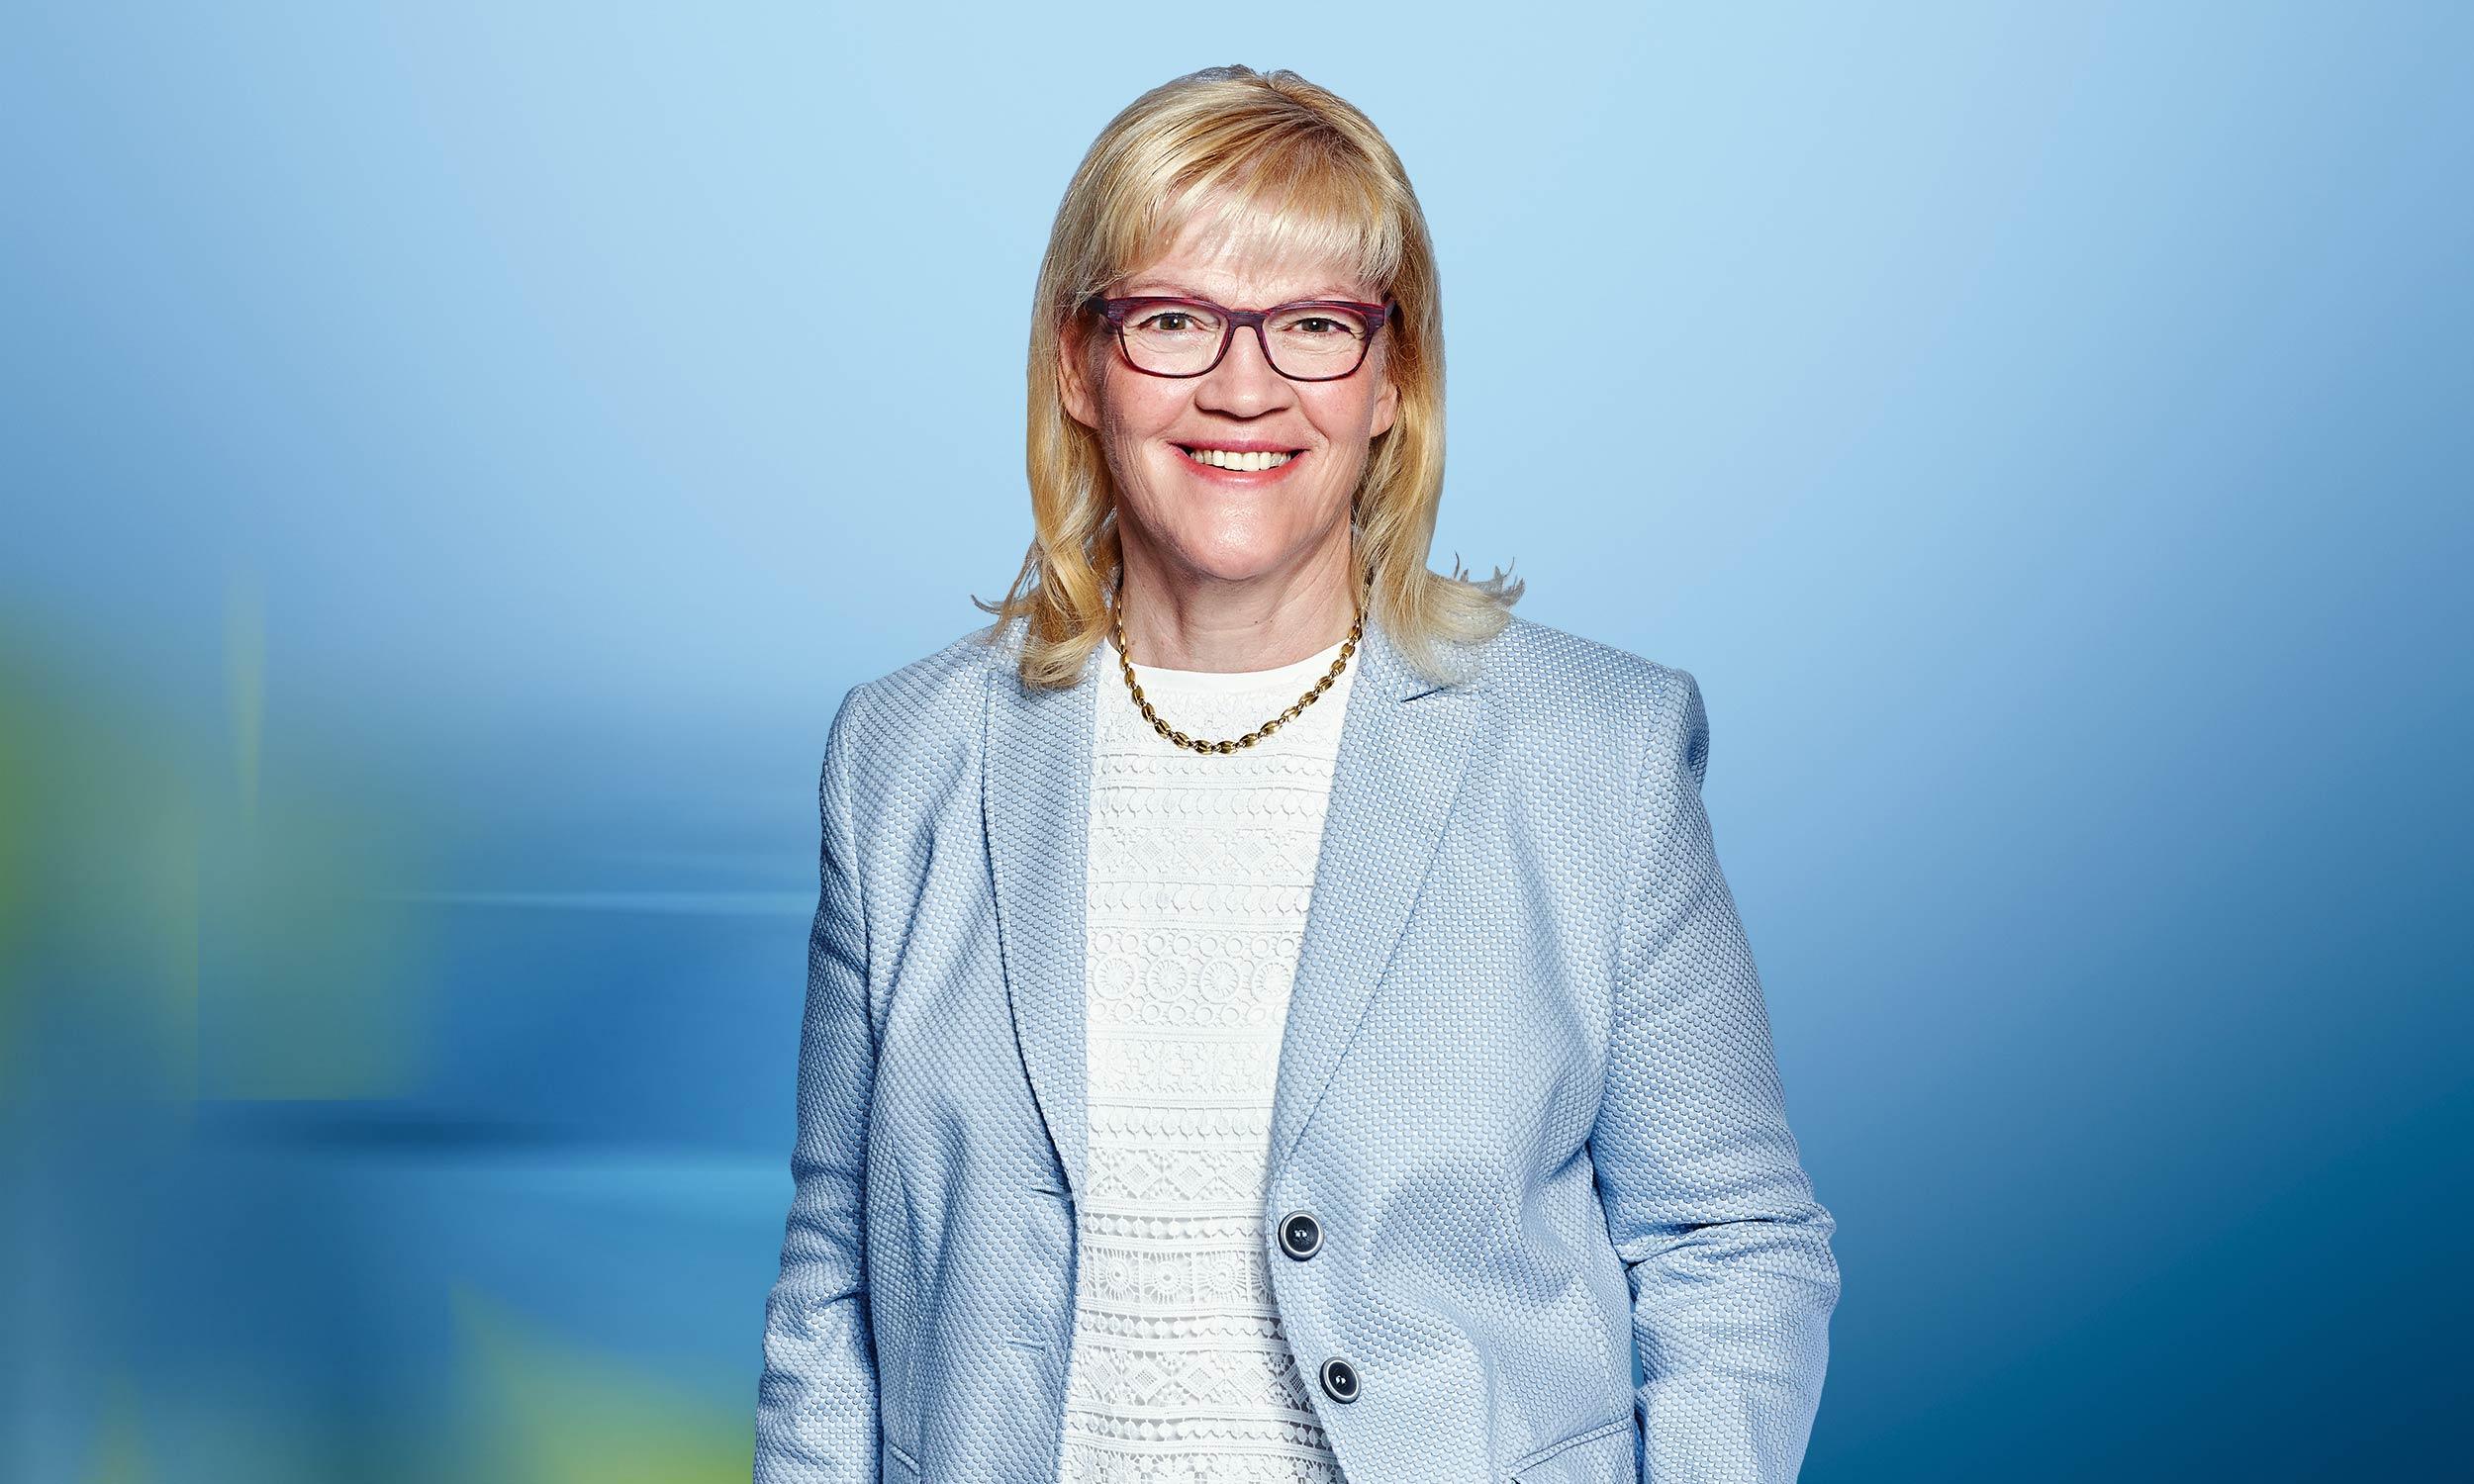 Patricia Speck-Braun